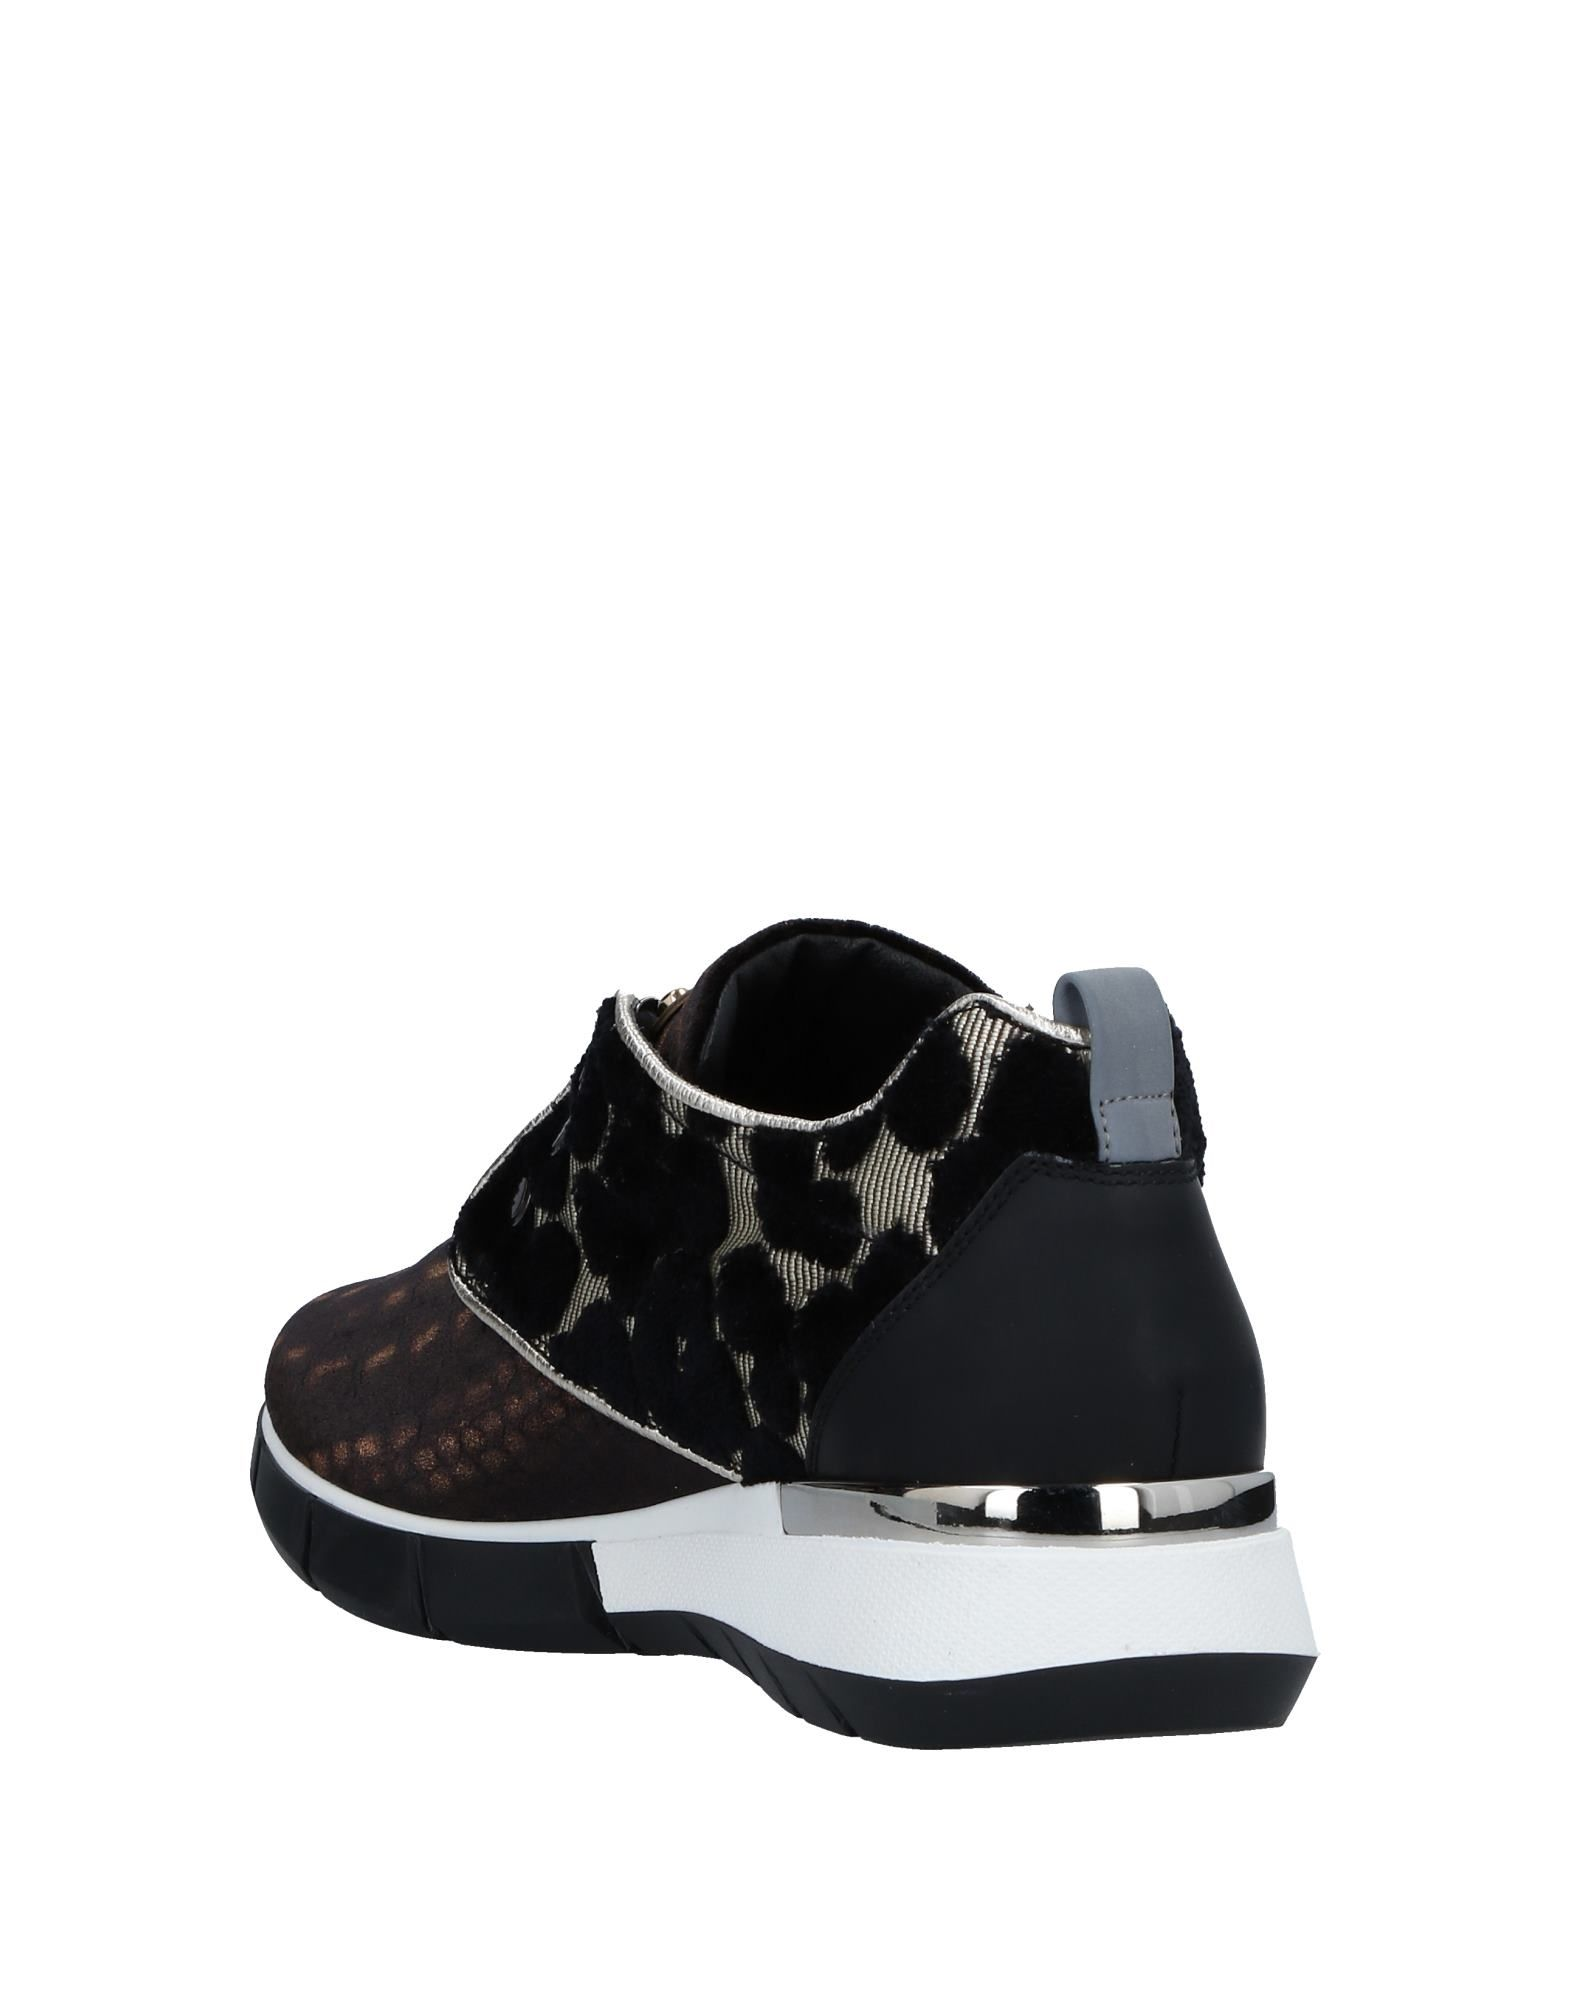 Barracuda Sneakers Damen  11535138RJGut Schuhe aussehende strapazierfähige Schuhe 11535138RJGut 2d1825